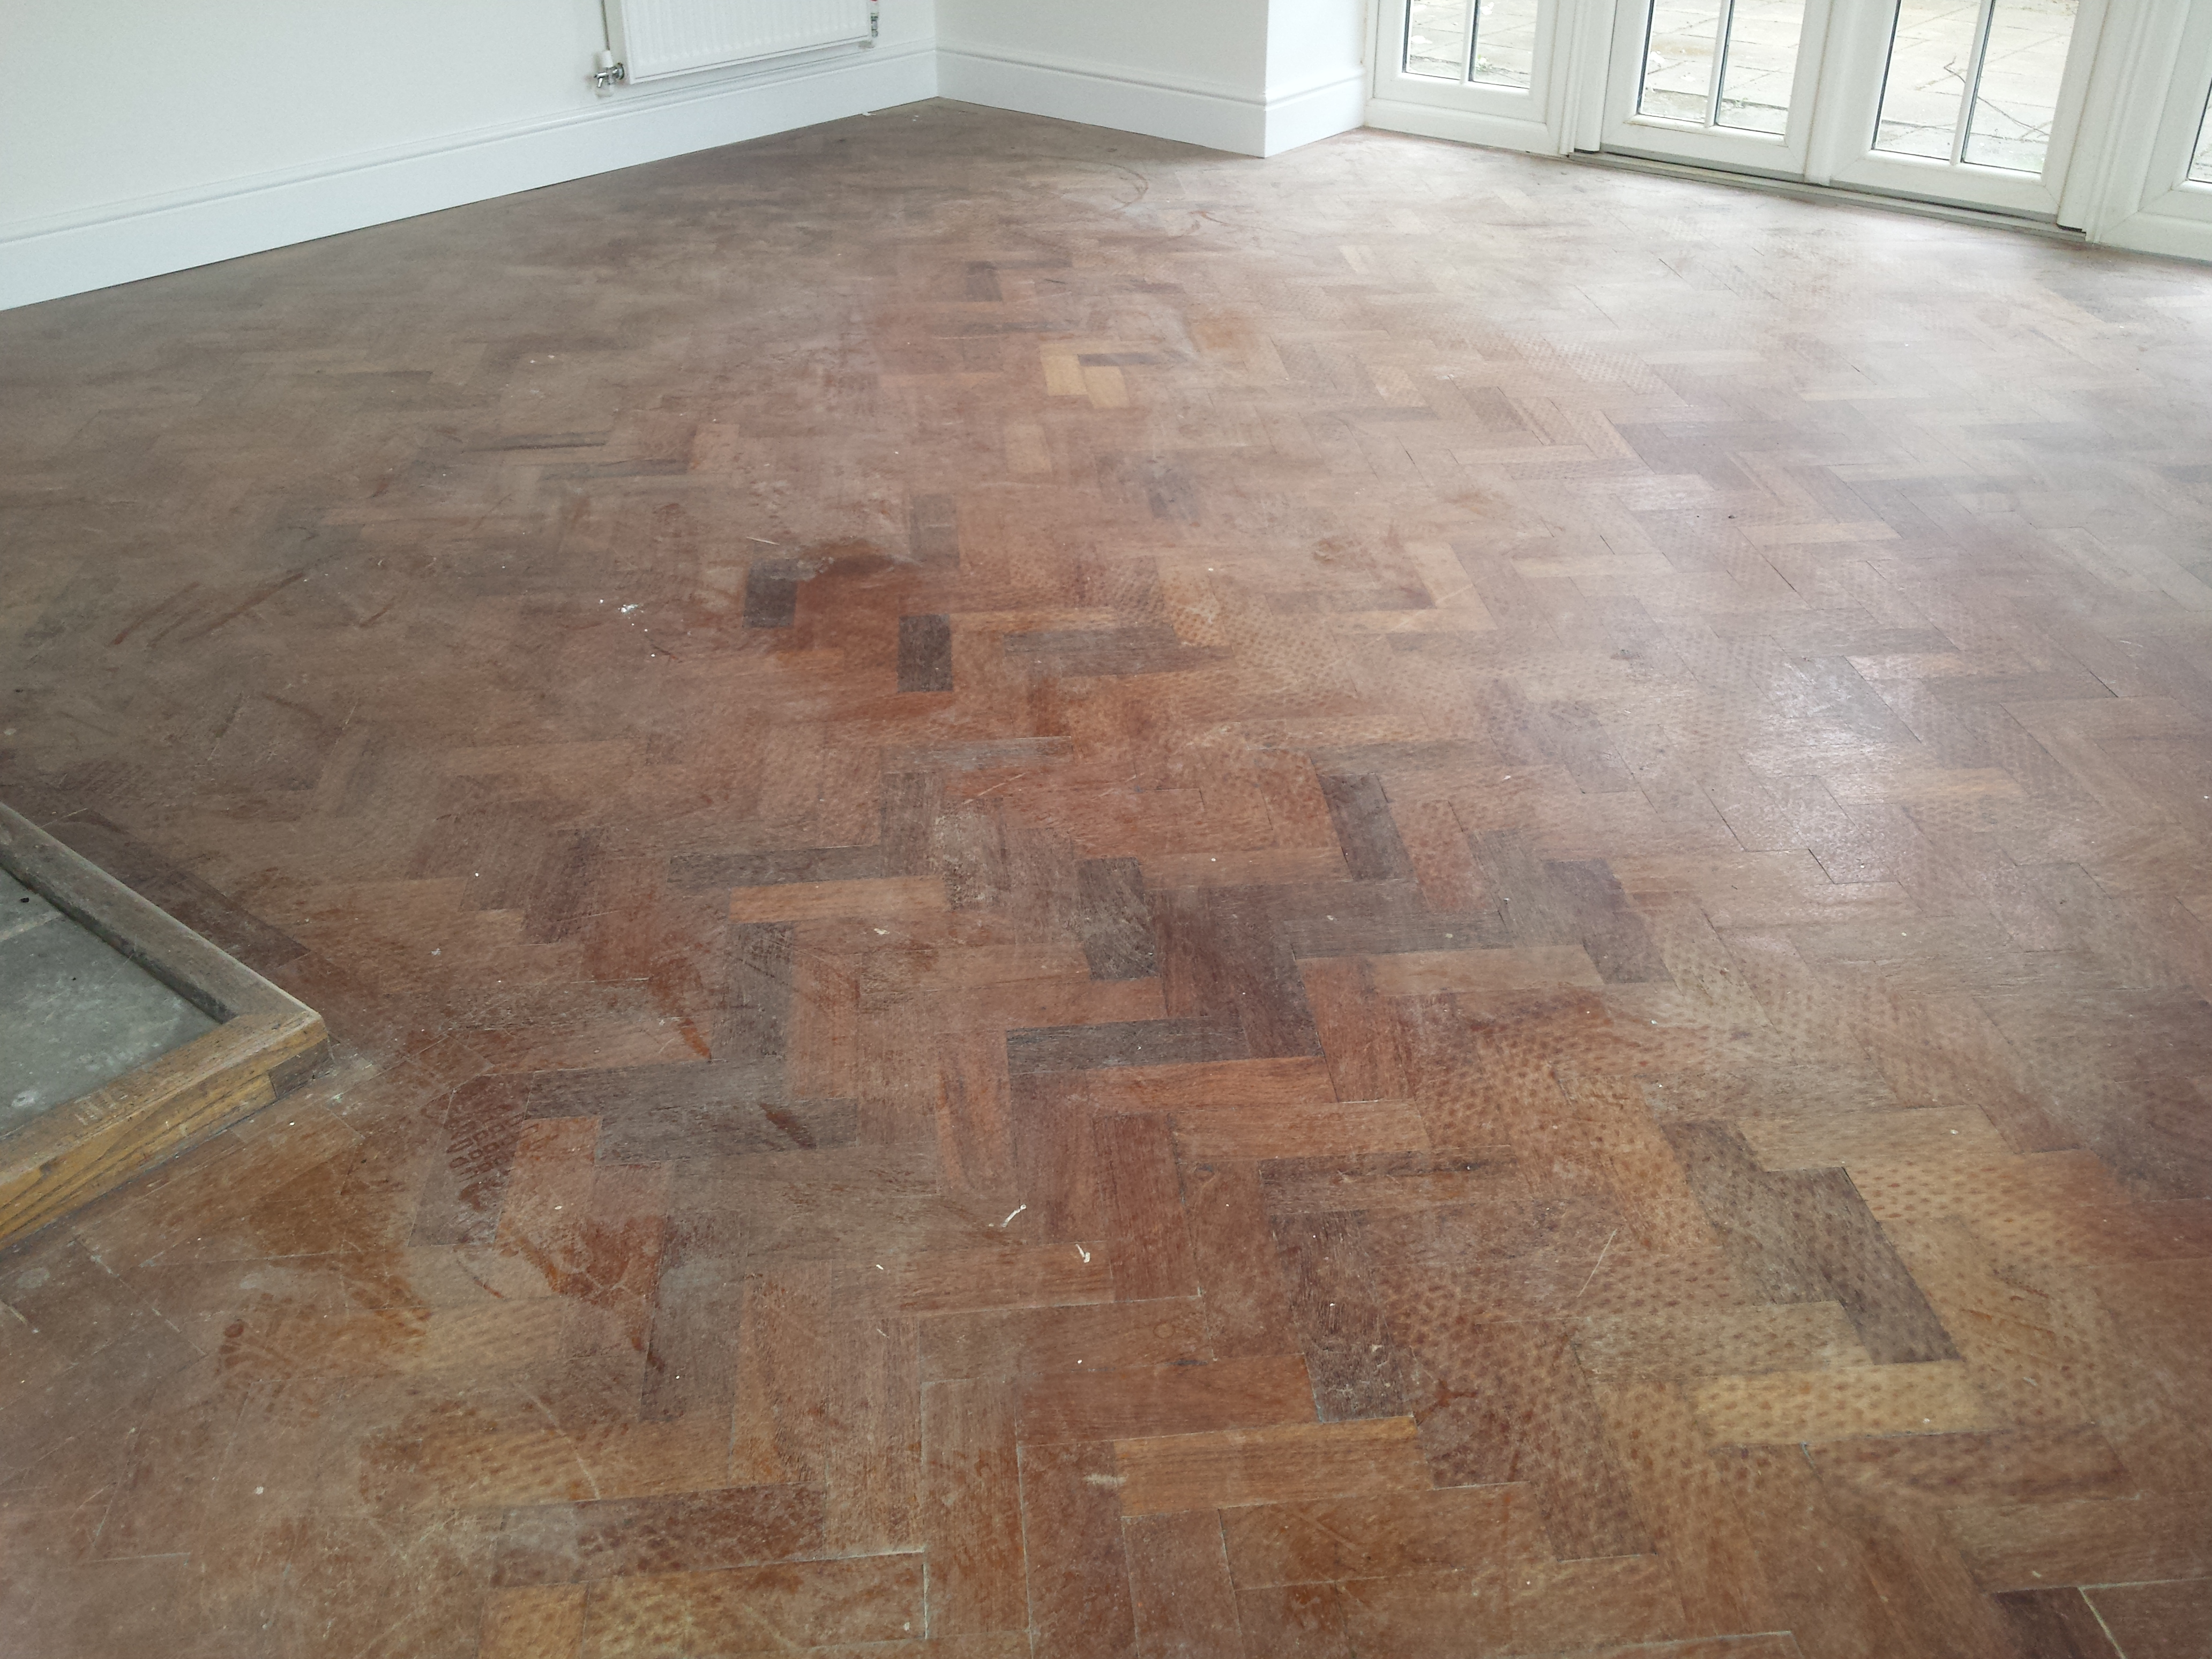 Wood floor restoration oxford floor restore oxford ltd for Wood floor maintenance